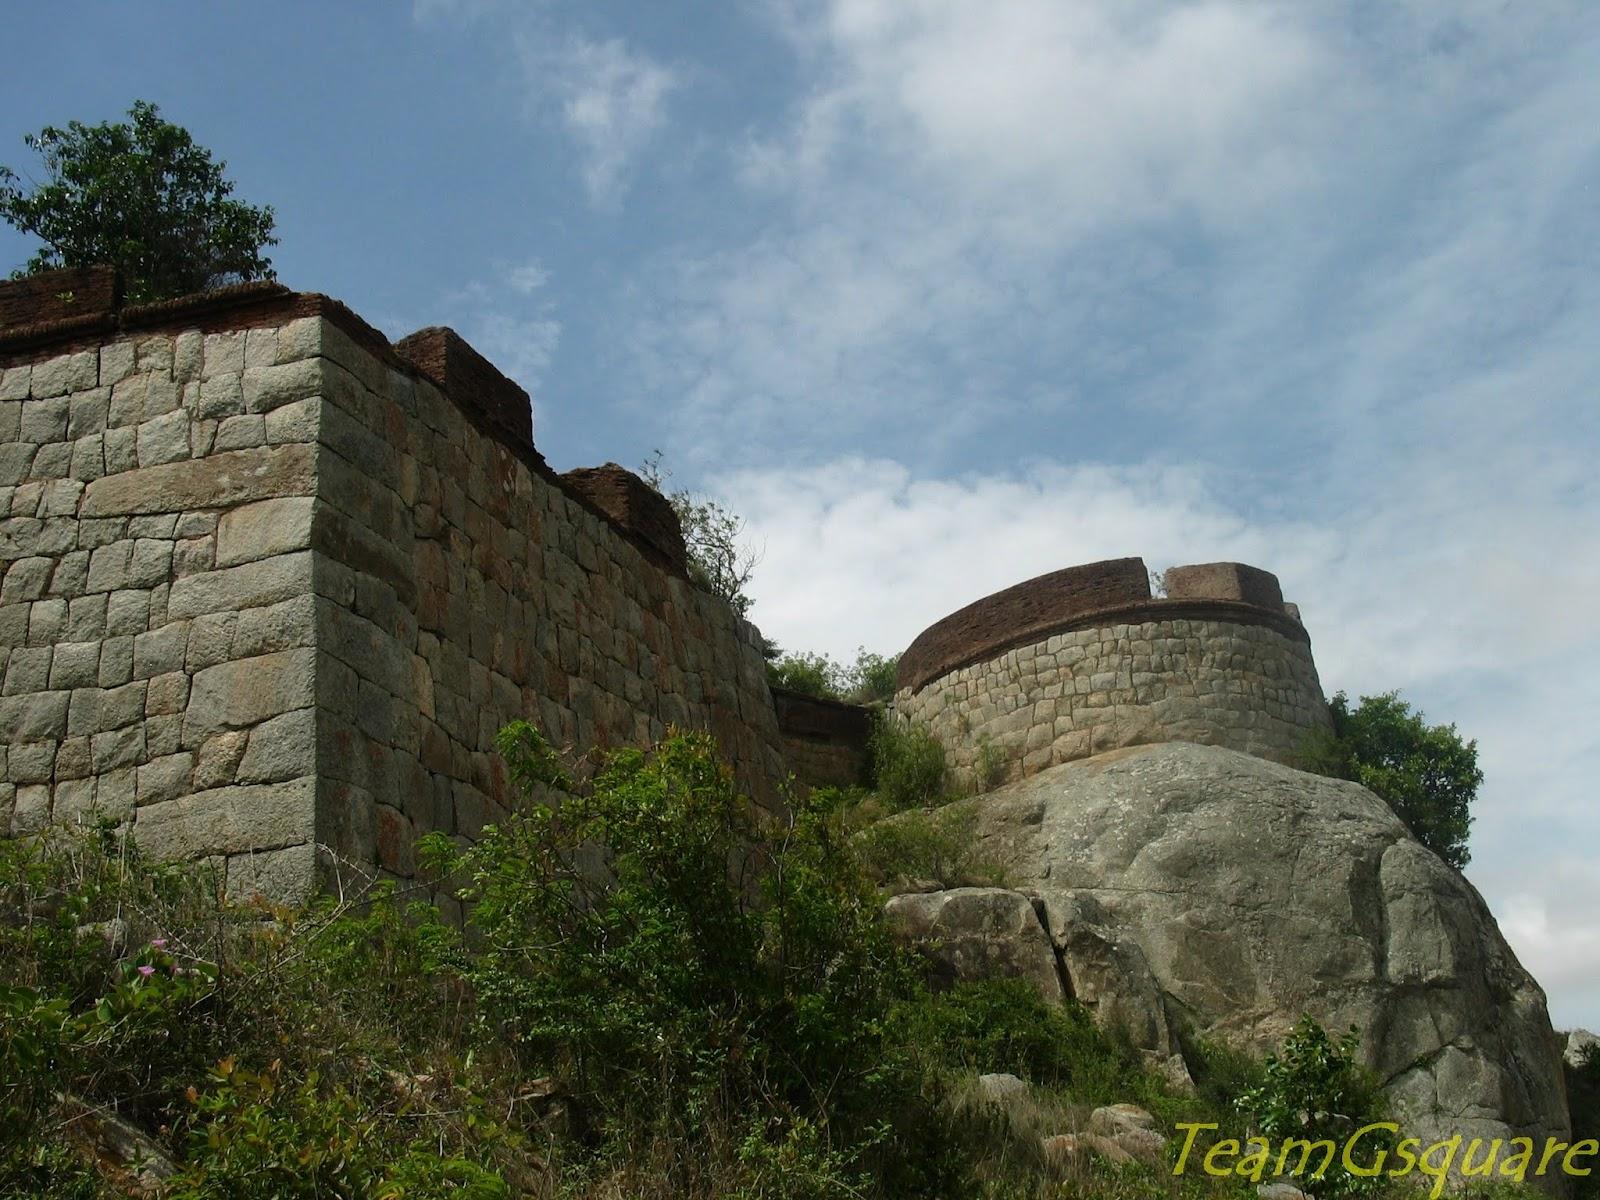 Rehmangarh